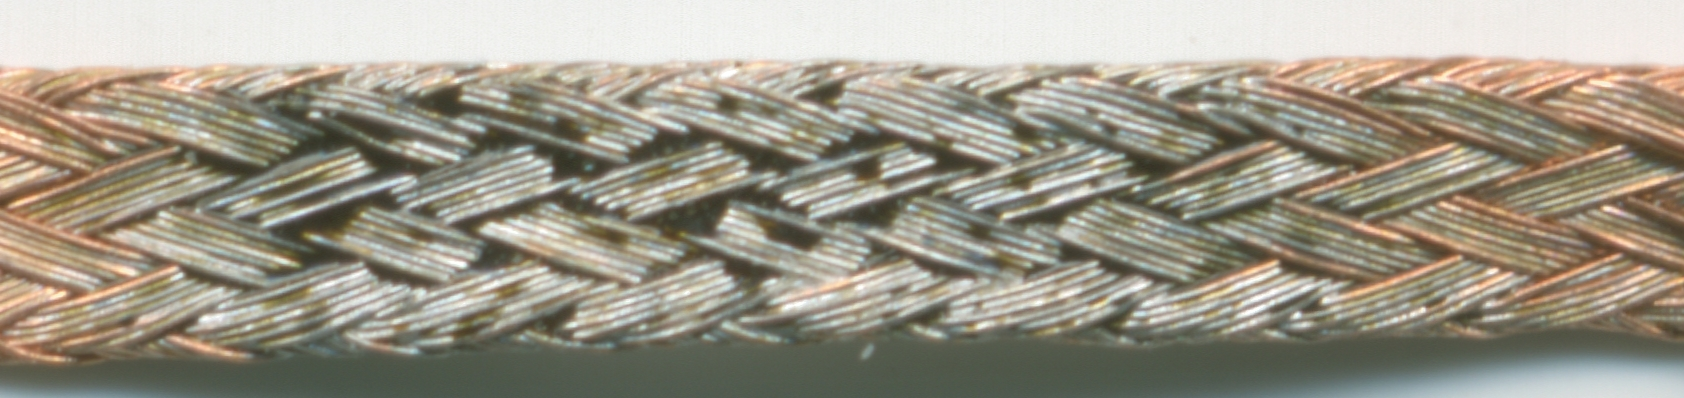 solder wick-close up-solder impurities pnr°0112.jpg